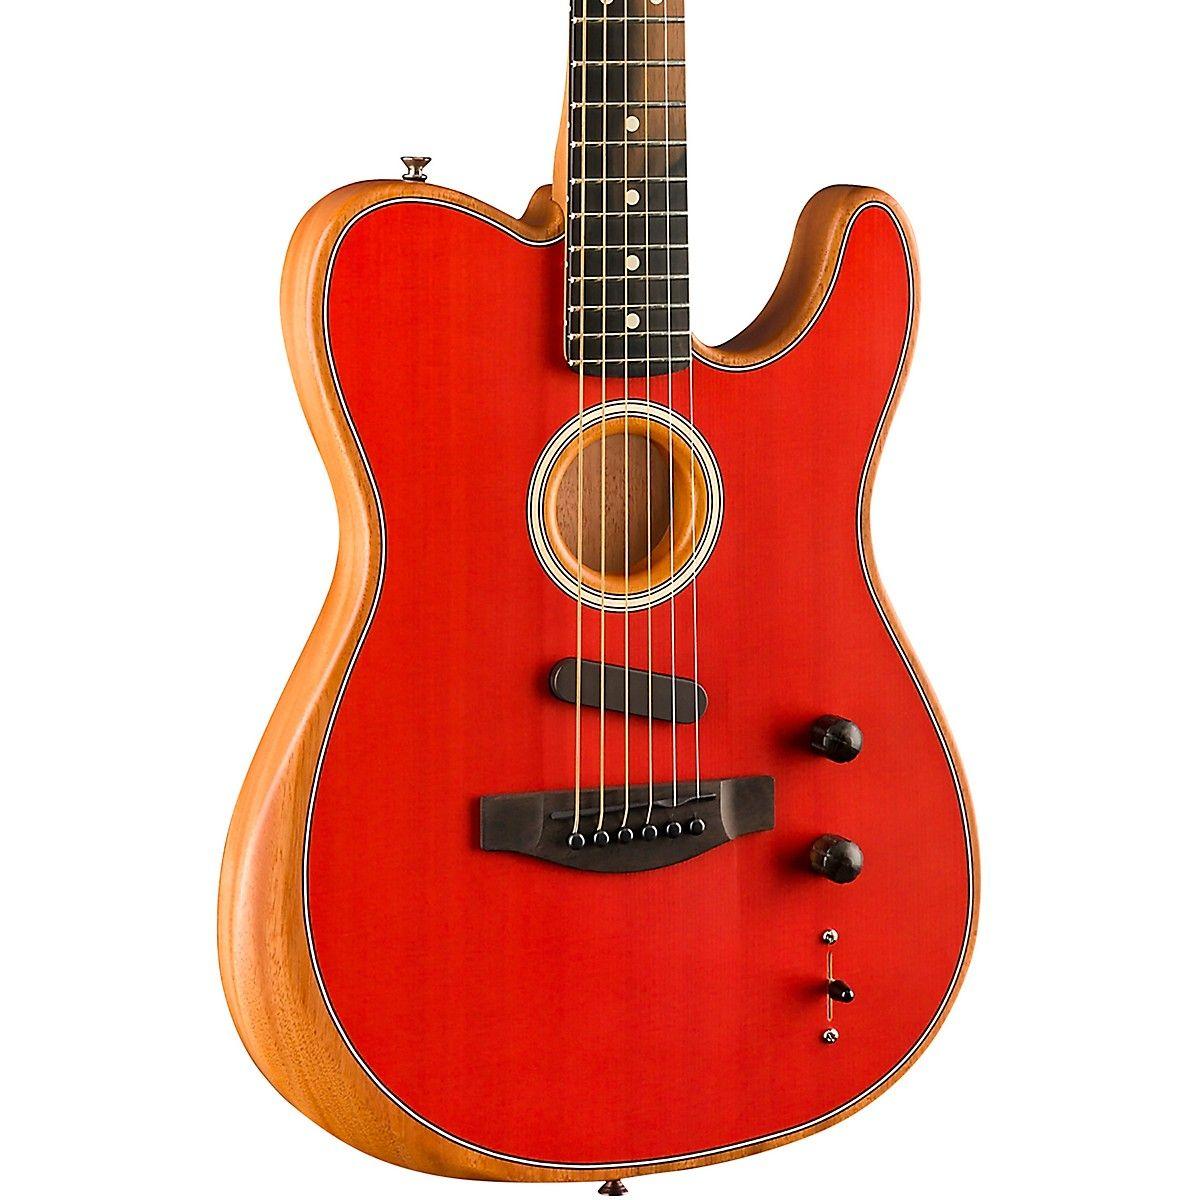 Fender Acoustasonic Telecaster Acoustic Electric Guitar Dakota Red Guitar Center Guitar Electric Guitar Acoustic Electric Guitar